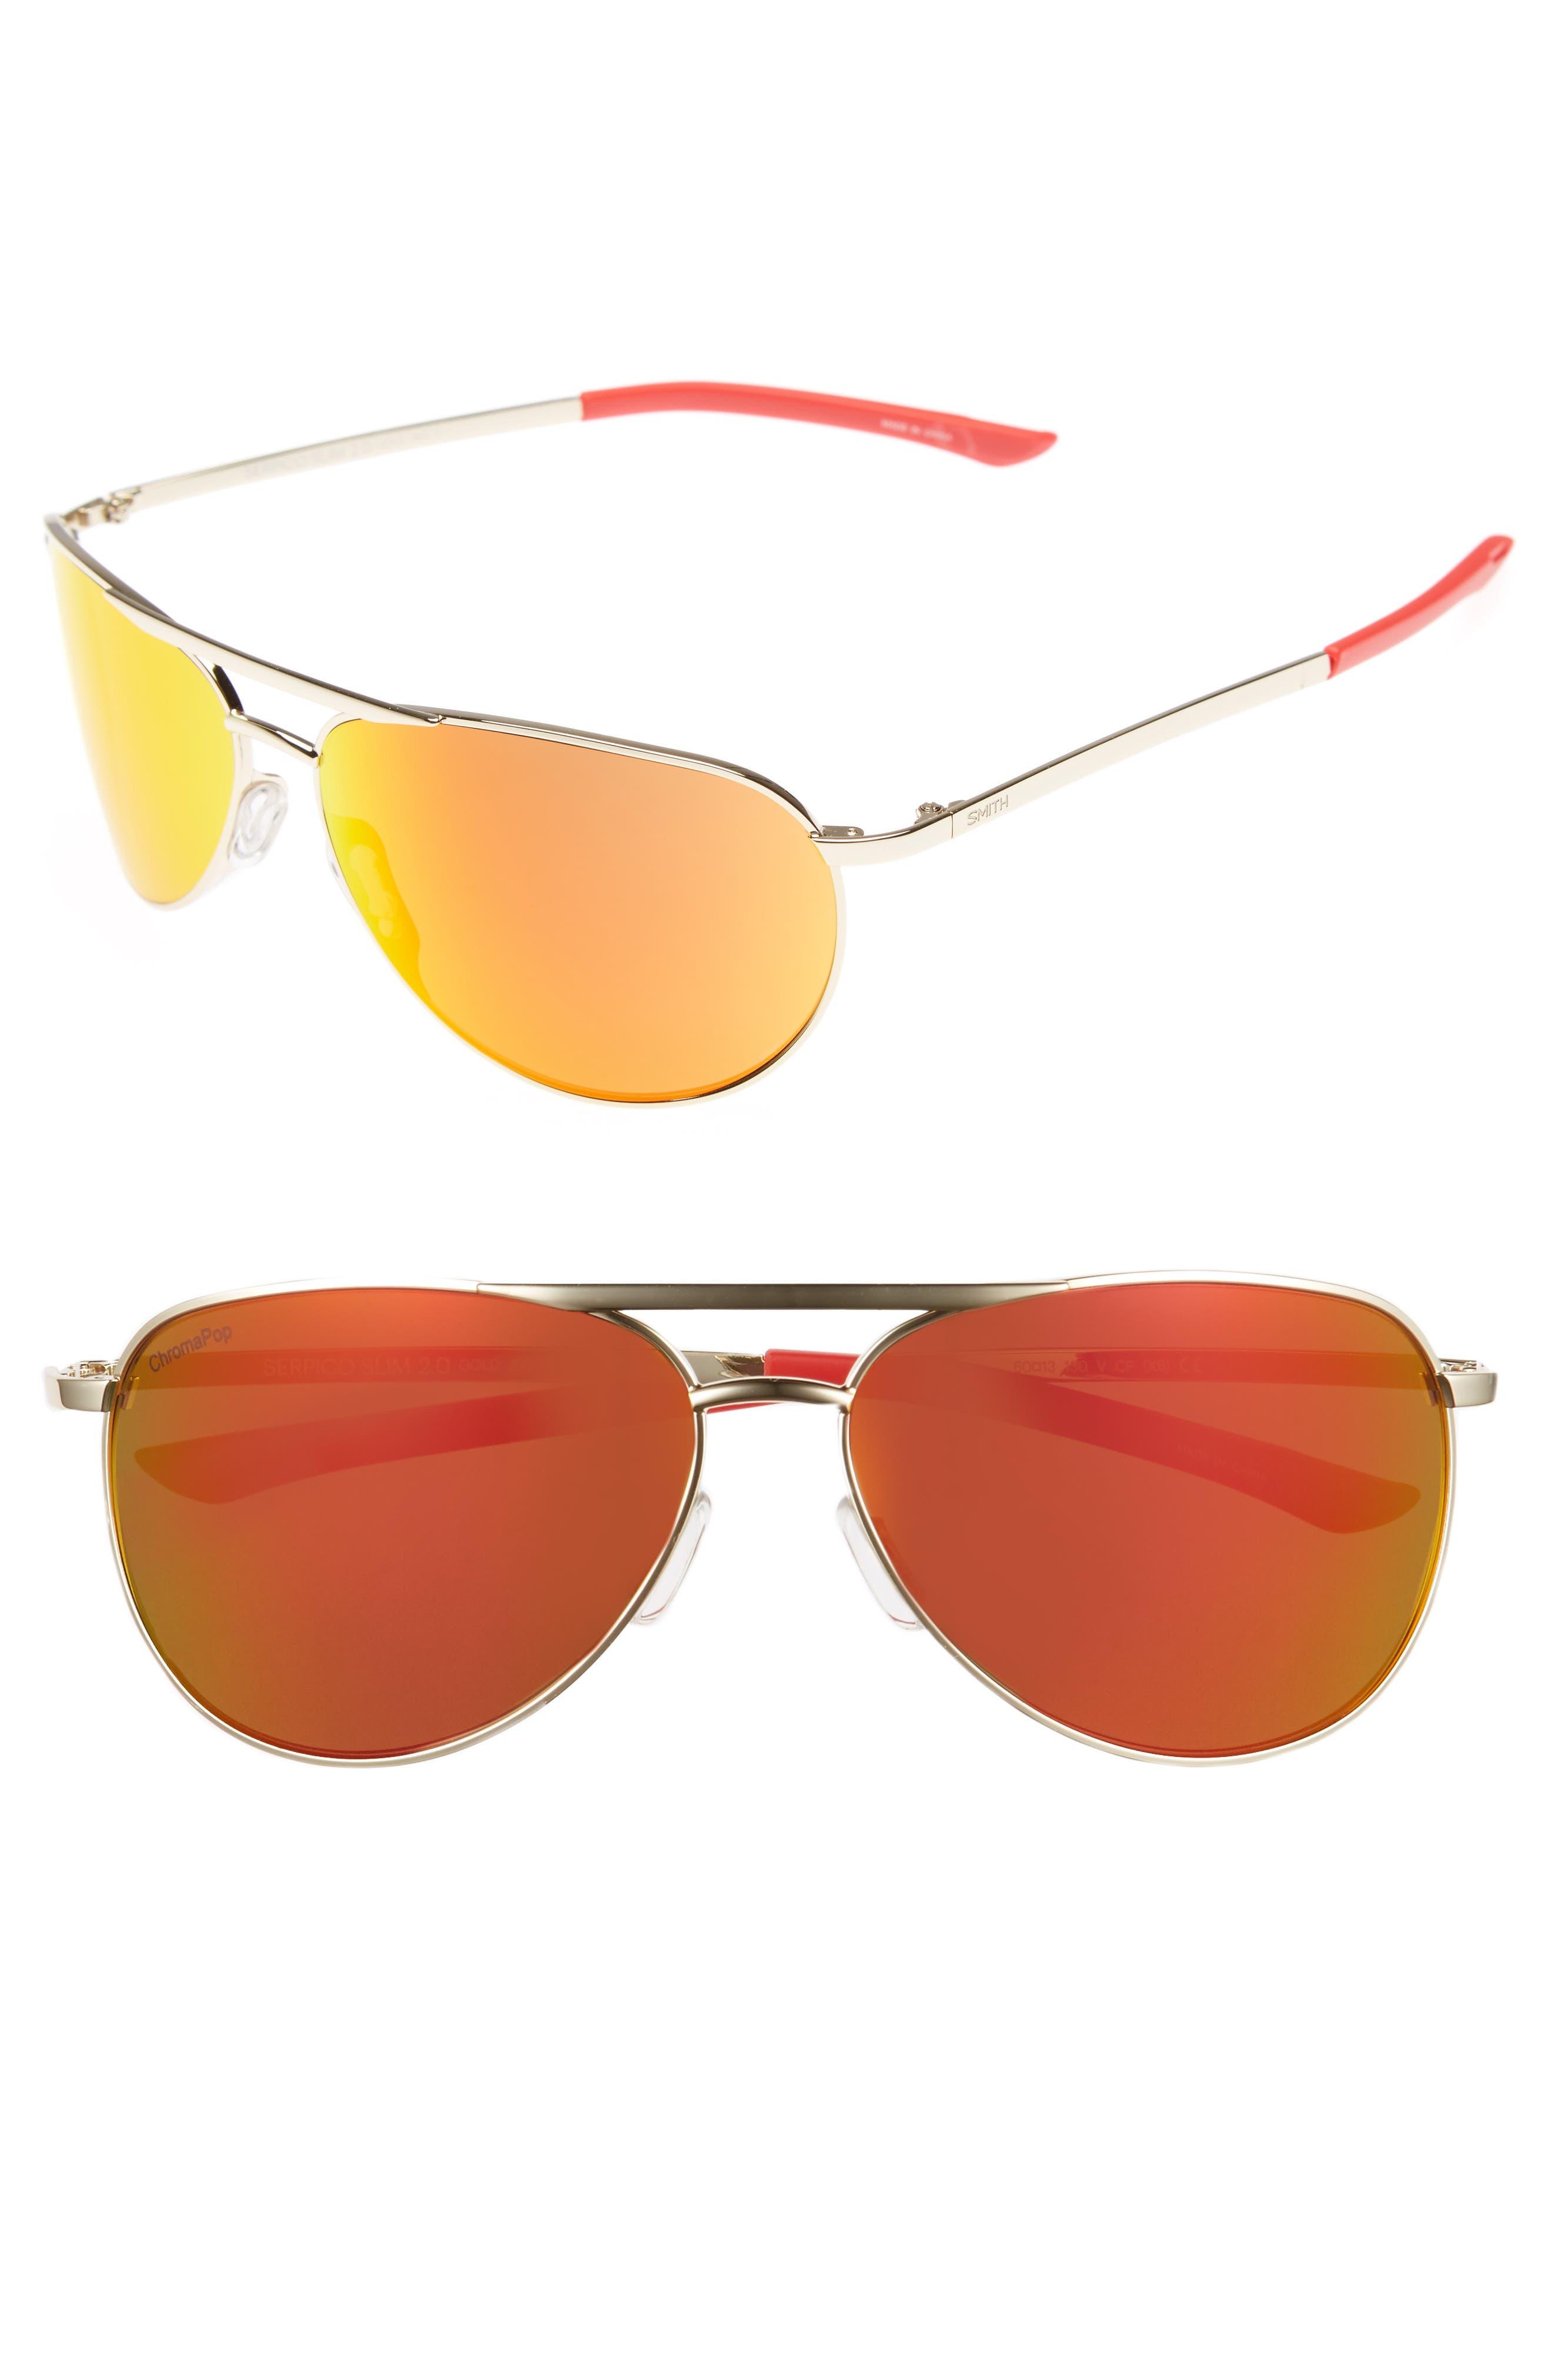 Main Image - Smith Serpico Slim 2.0 60mm ChromaPop Polarized Aviator Sunglasses